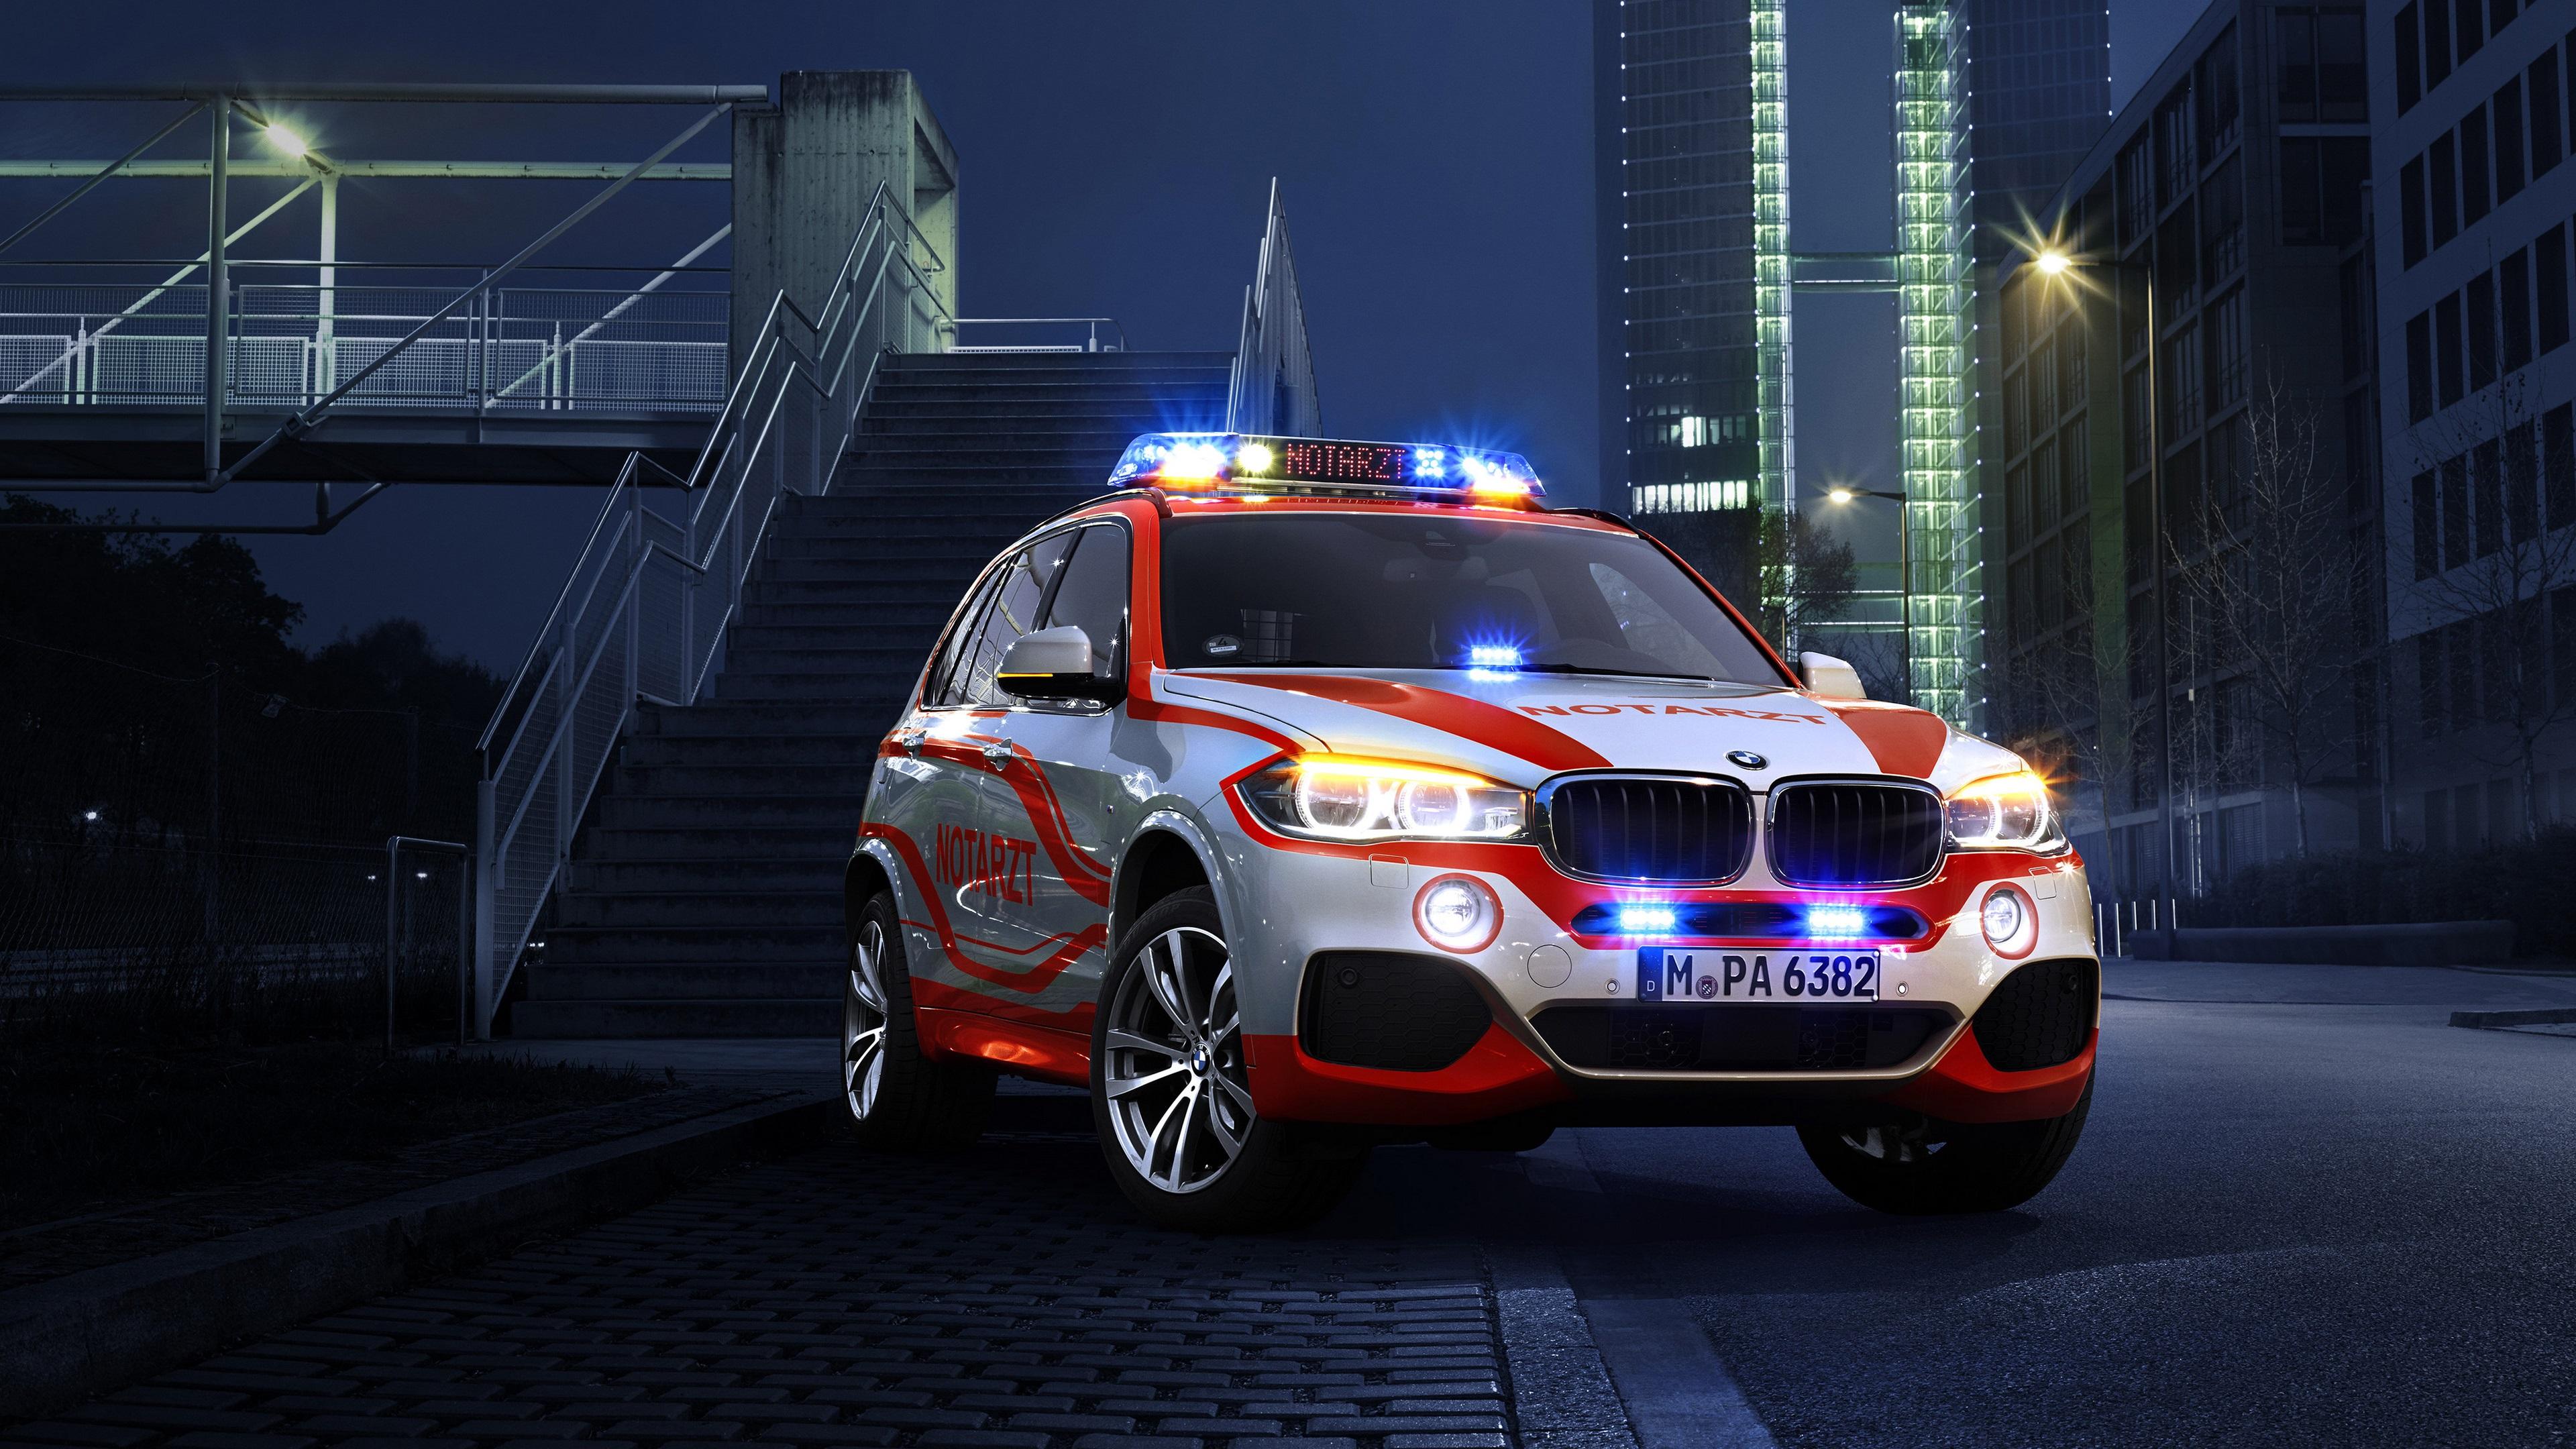 wallpaper bmw x5 xdrive30d police car at night 3840x2160 uhd 4k